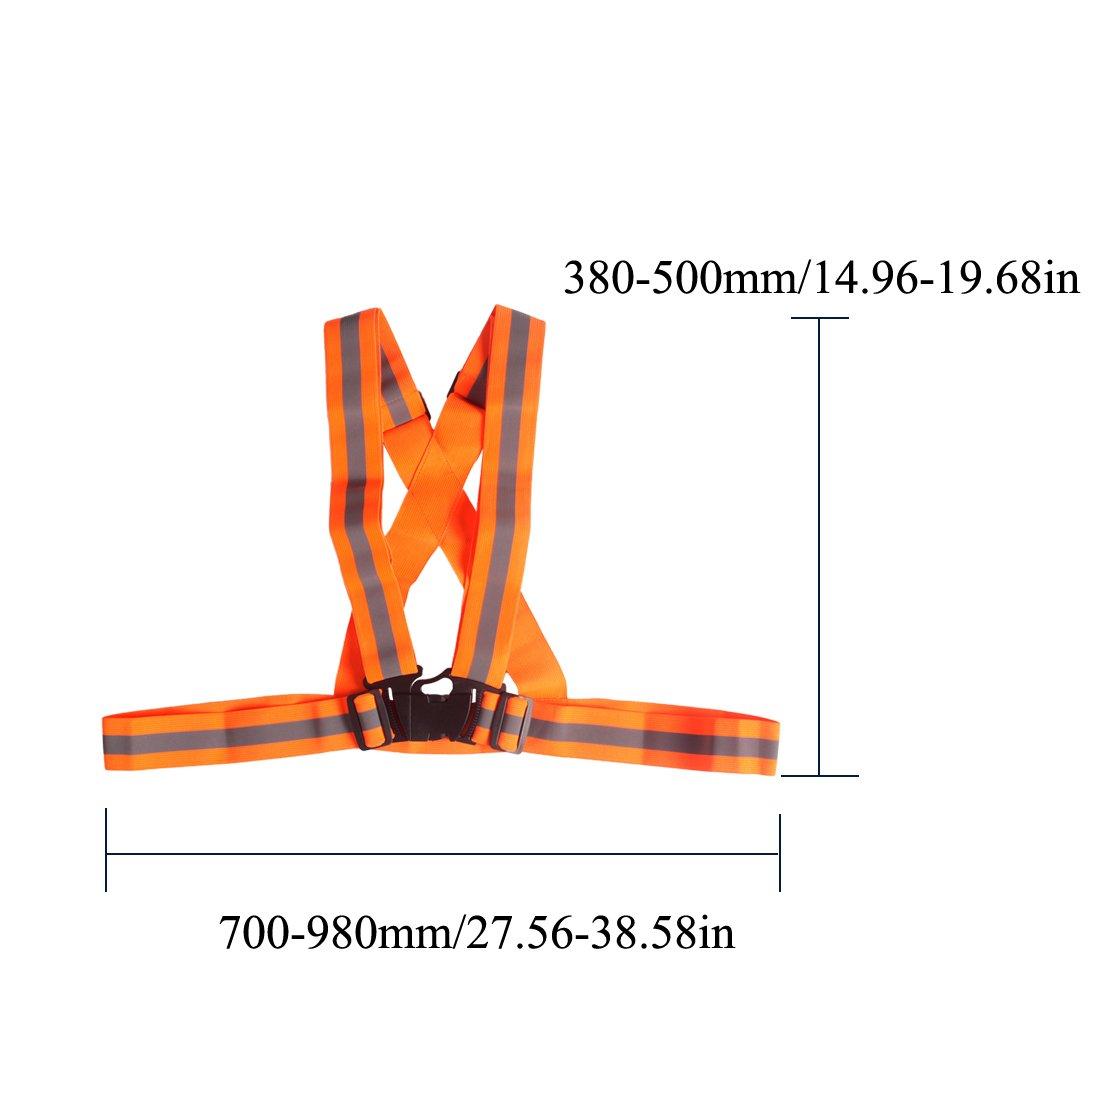 Andux Zone Chaleco Reflectante Adultos Alta Visibilidad para Correr Jogging Walking Cycling FGBX-01 1 Pieza, Magenta